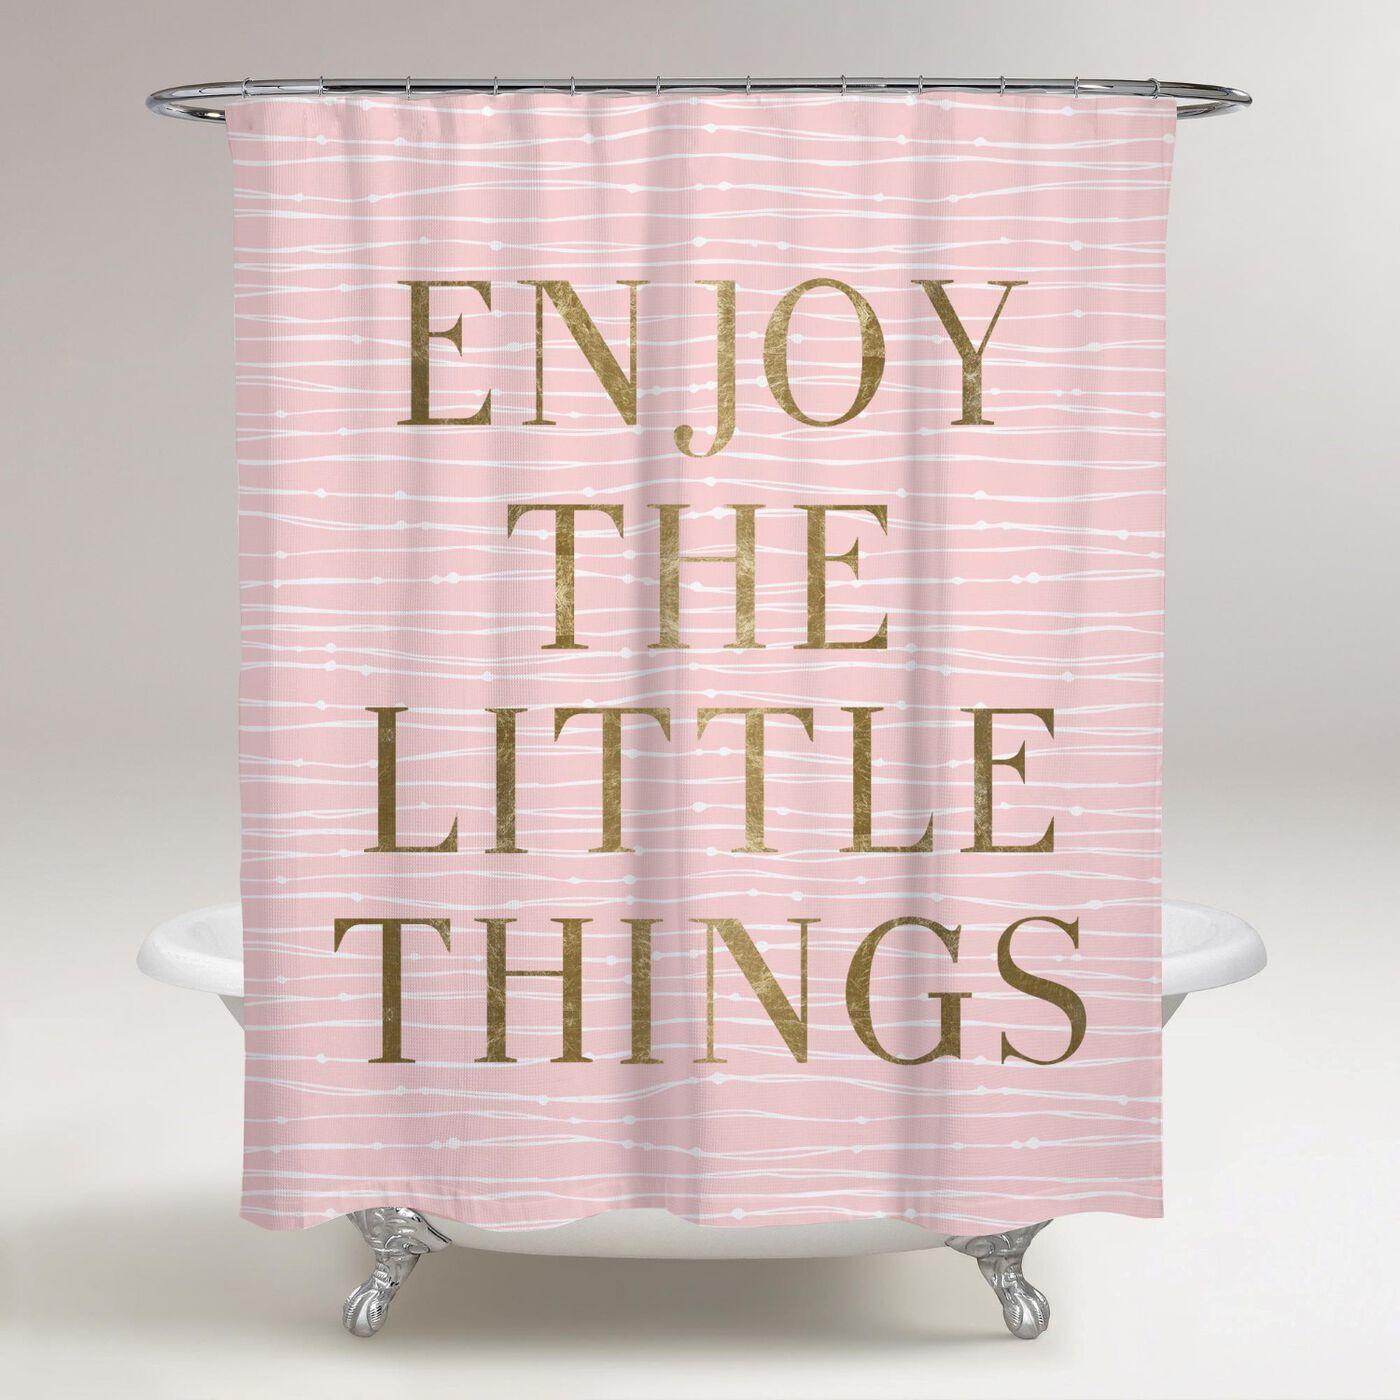 Enjoy Everything Shower Curtain